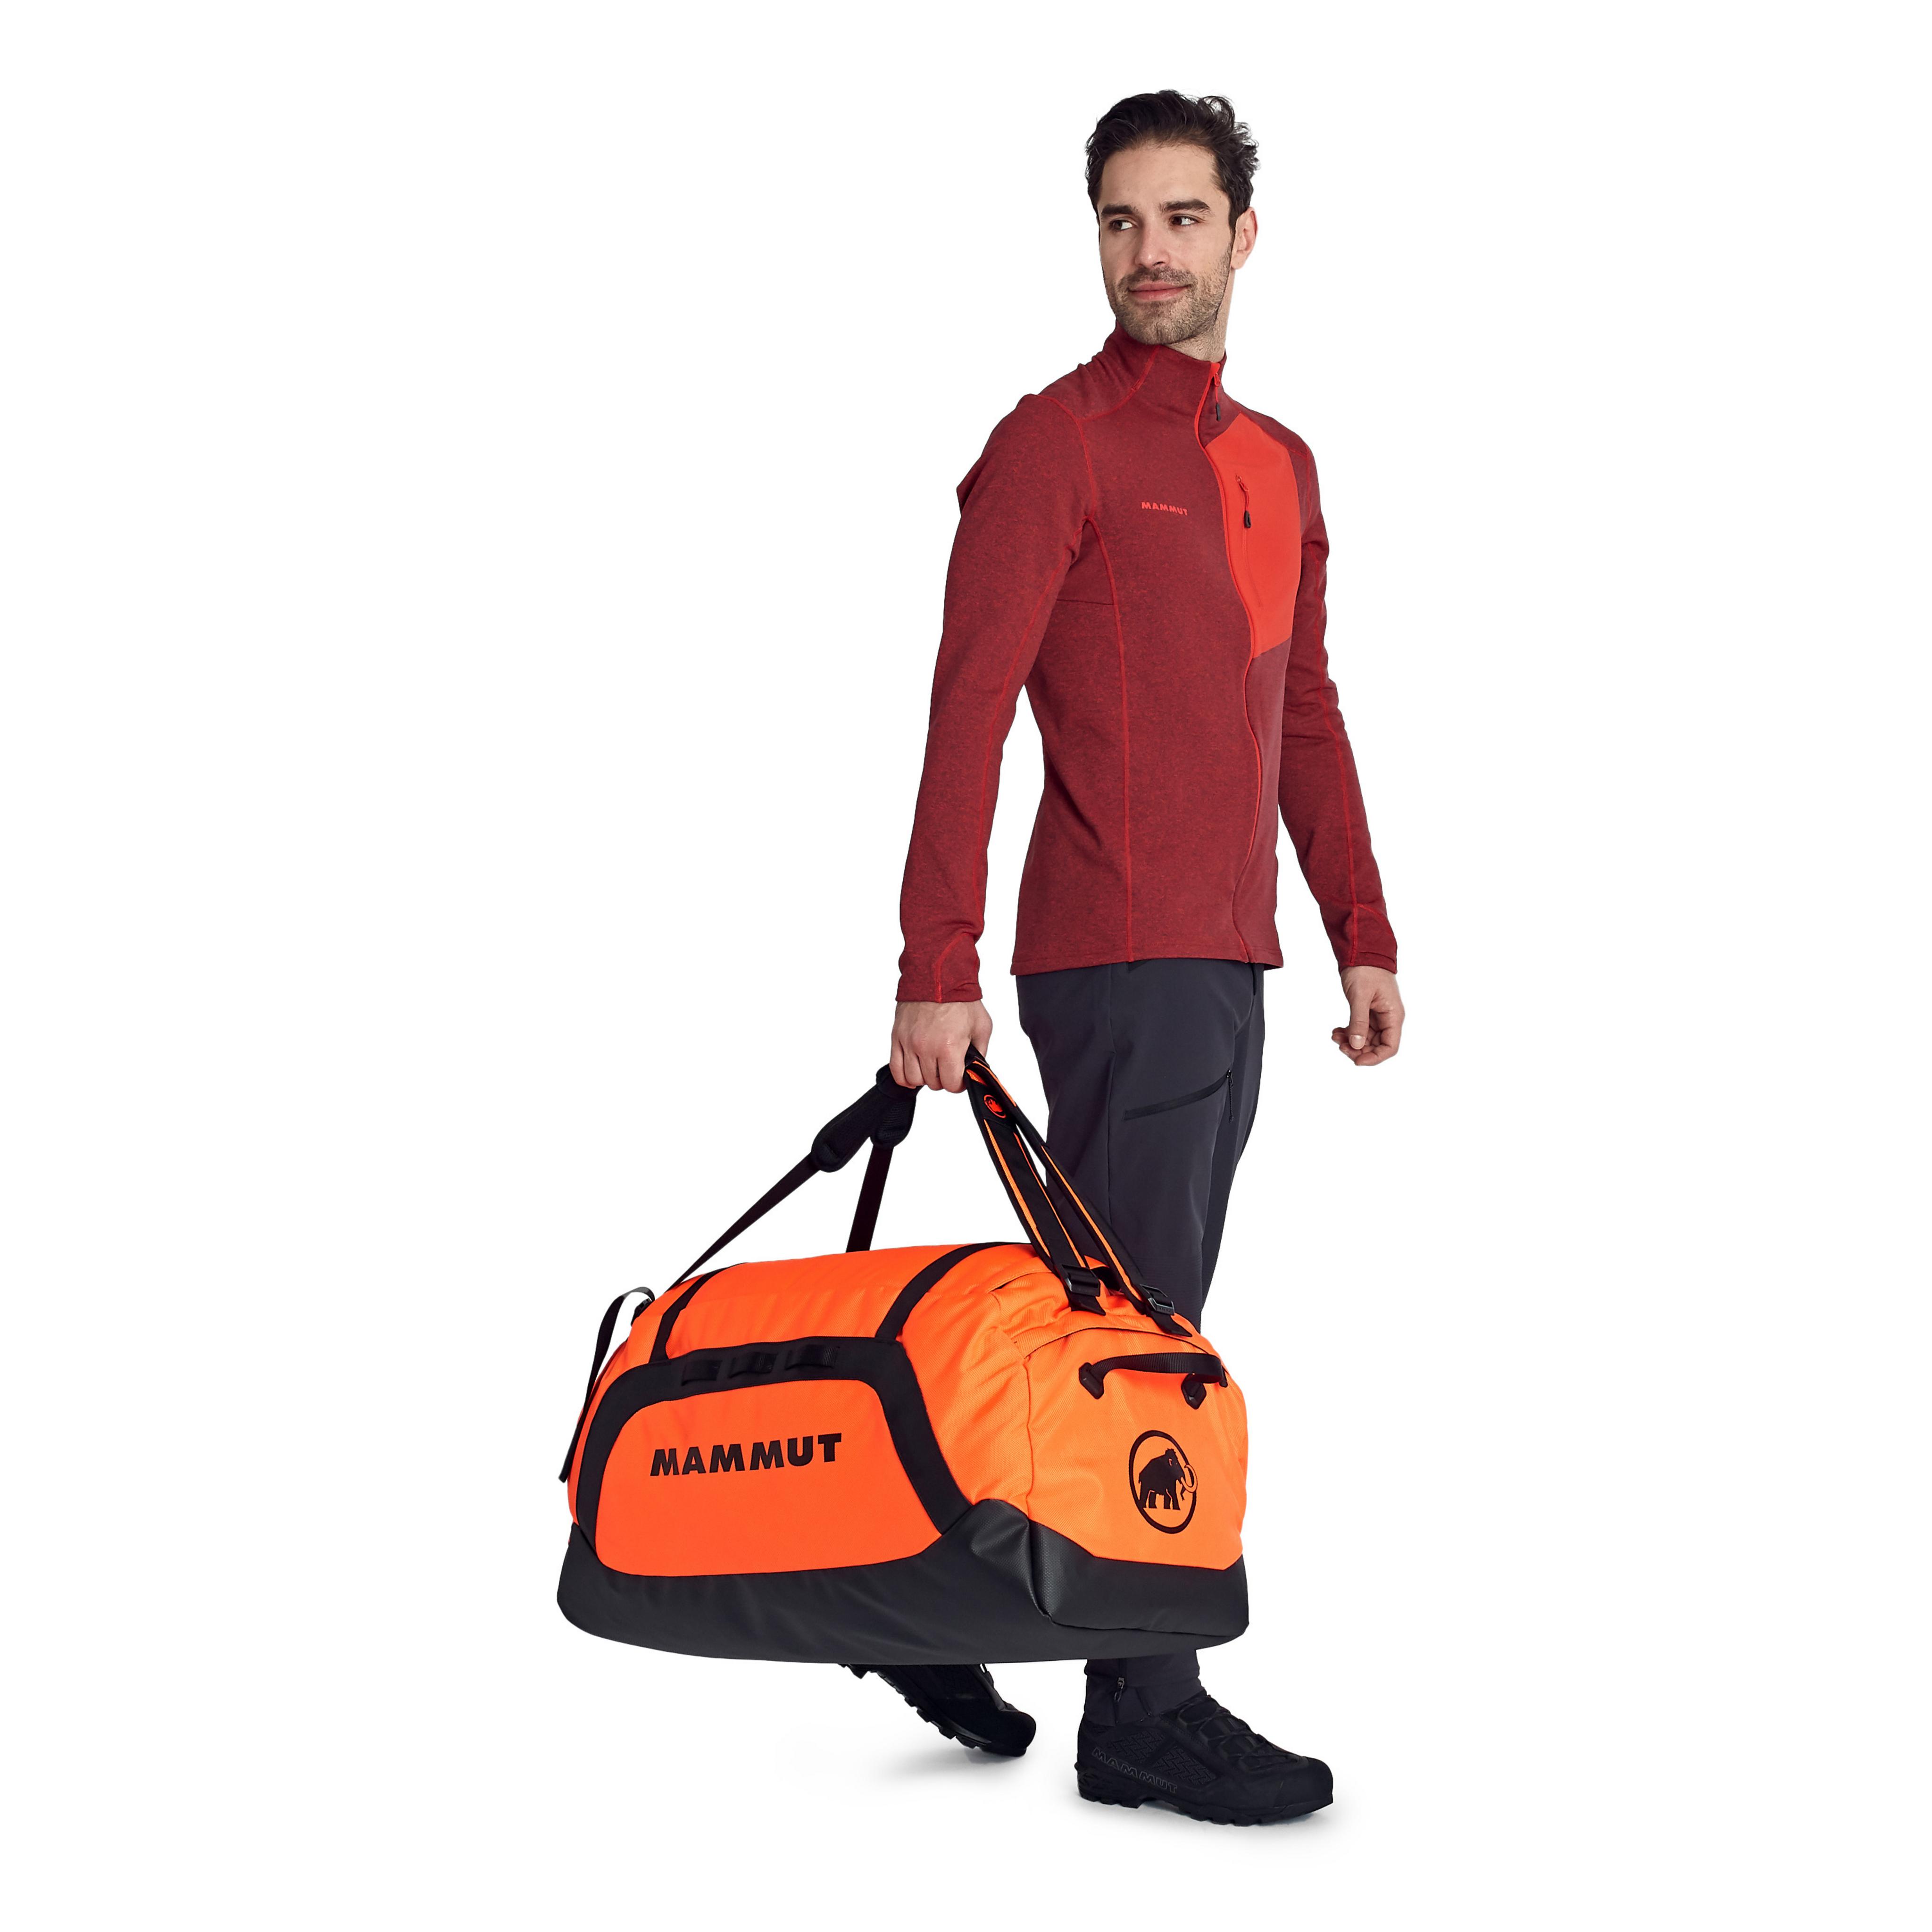 Cargon product image